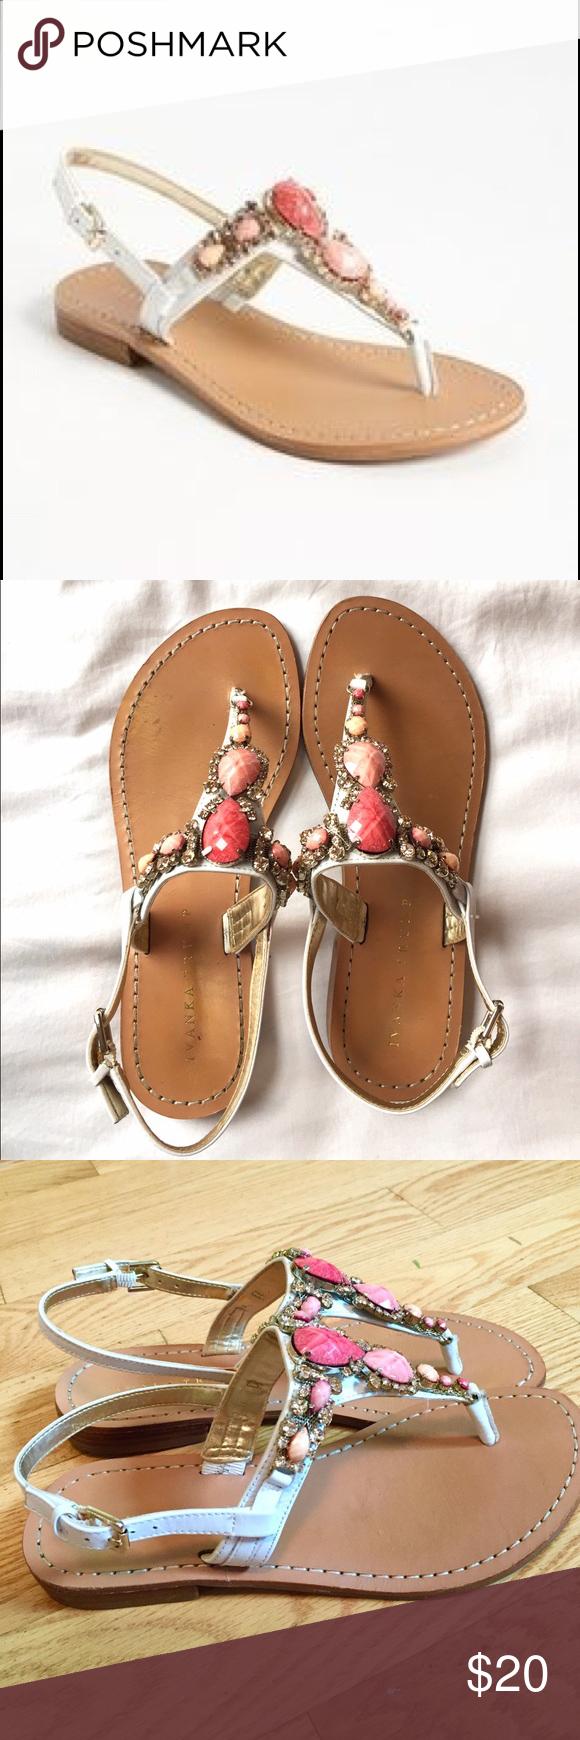 7ade9d33155df2 Ivanka Trump White Jeweled Sandals Ivanka Trump White Leather Pink Jewel  Sandals. Worn Once. Ivanka Trump Shoes Sandals